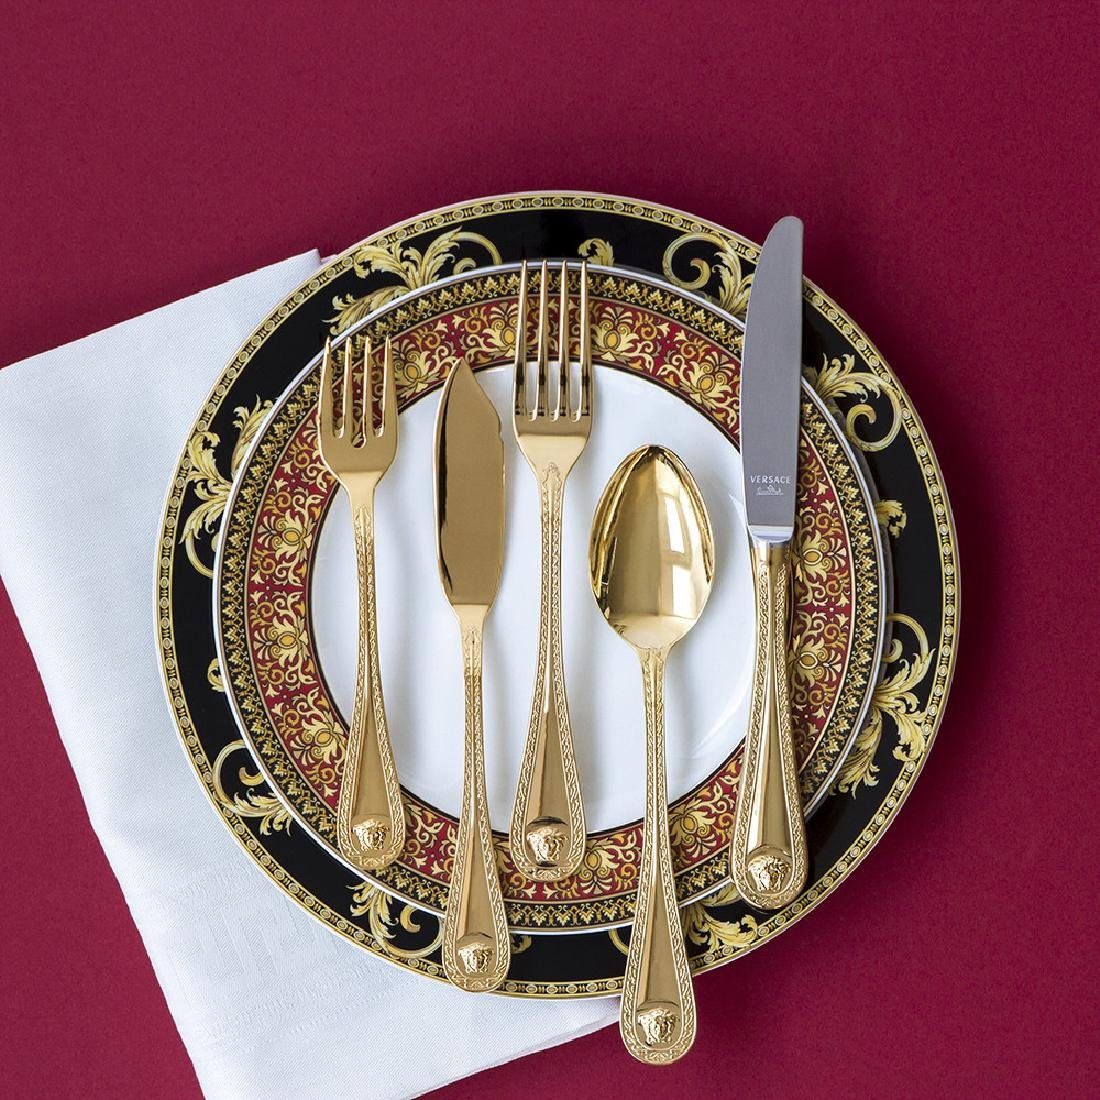 36 Piece Gilded Rosenthal Versace Cutlery Set